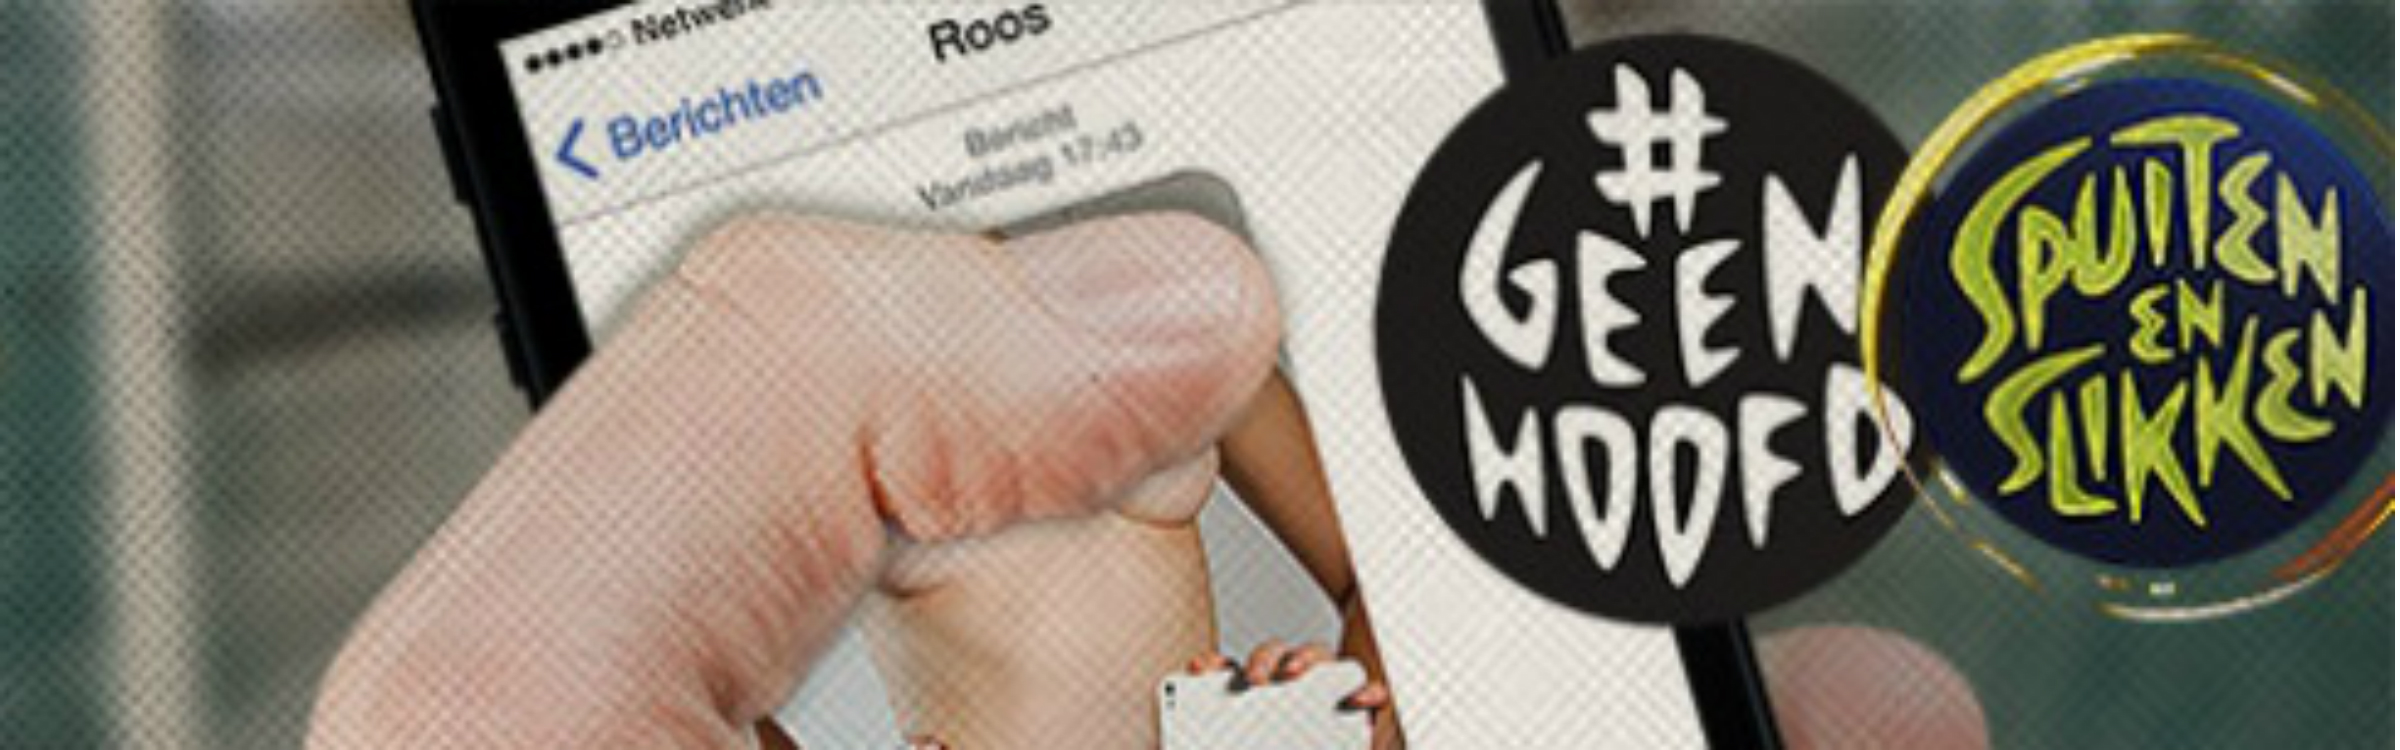 Sexting header